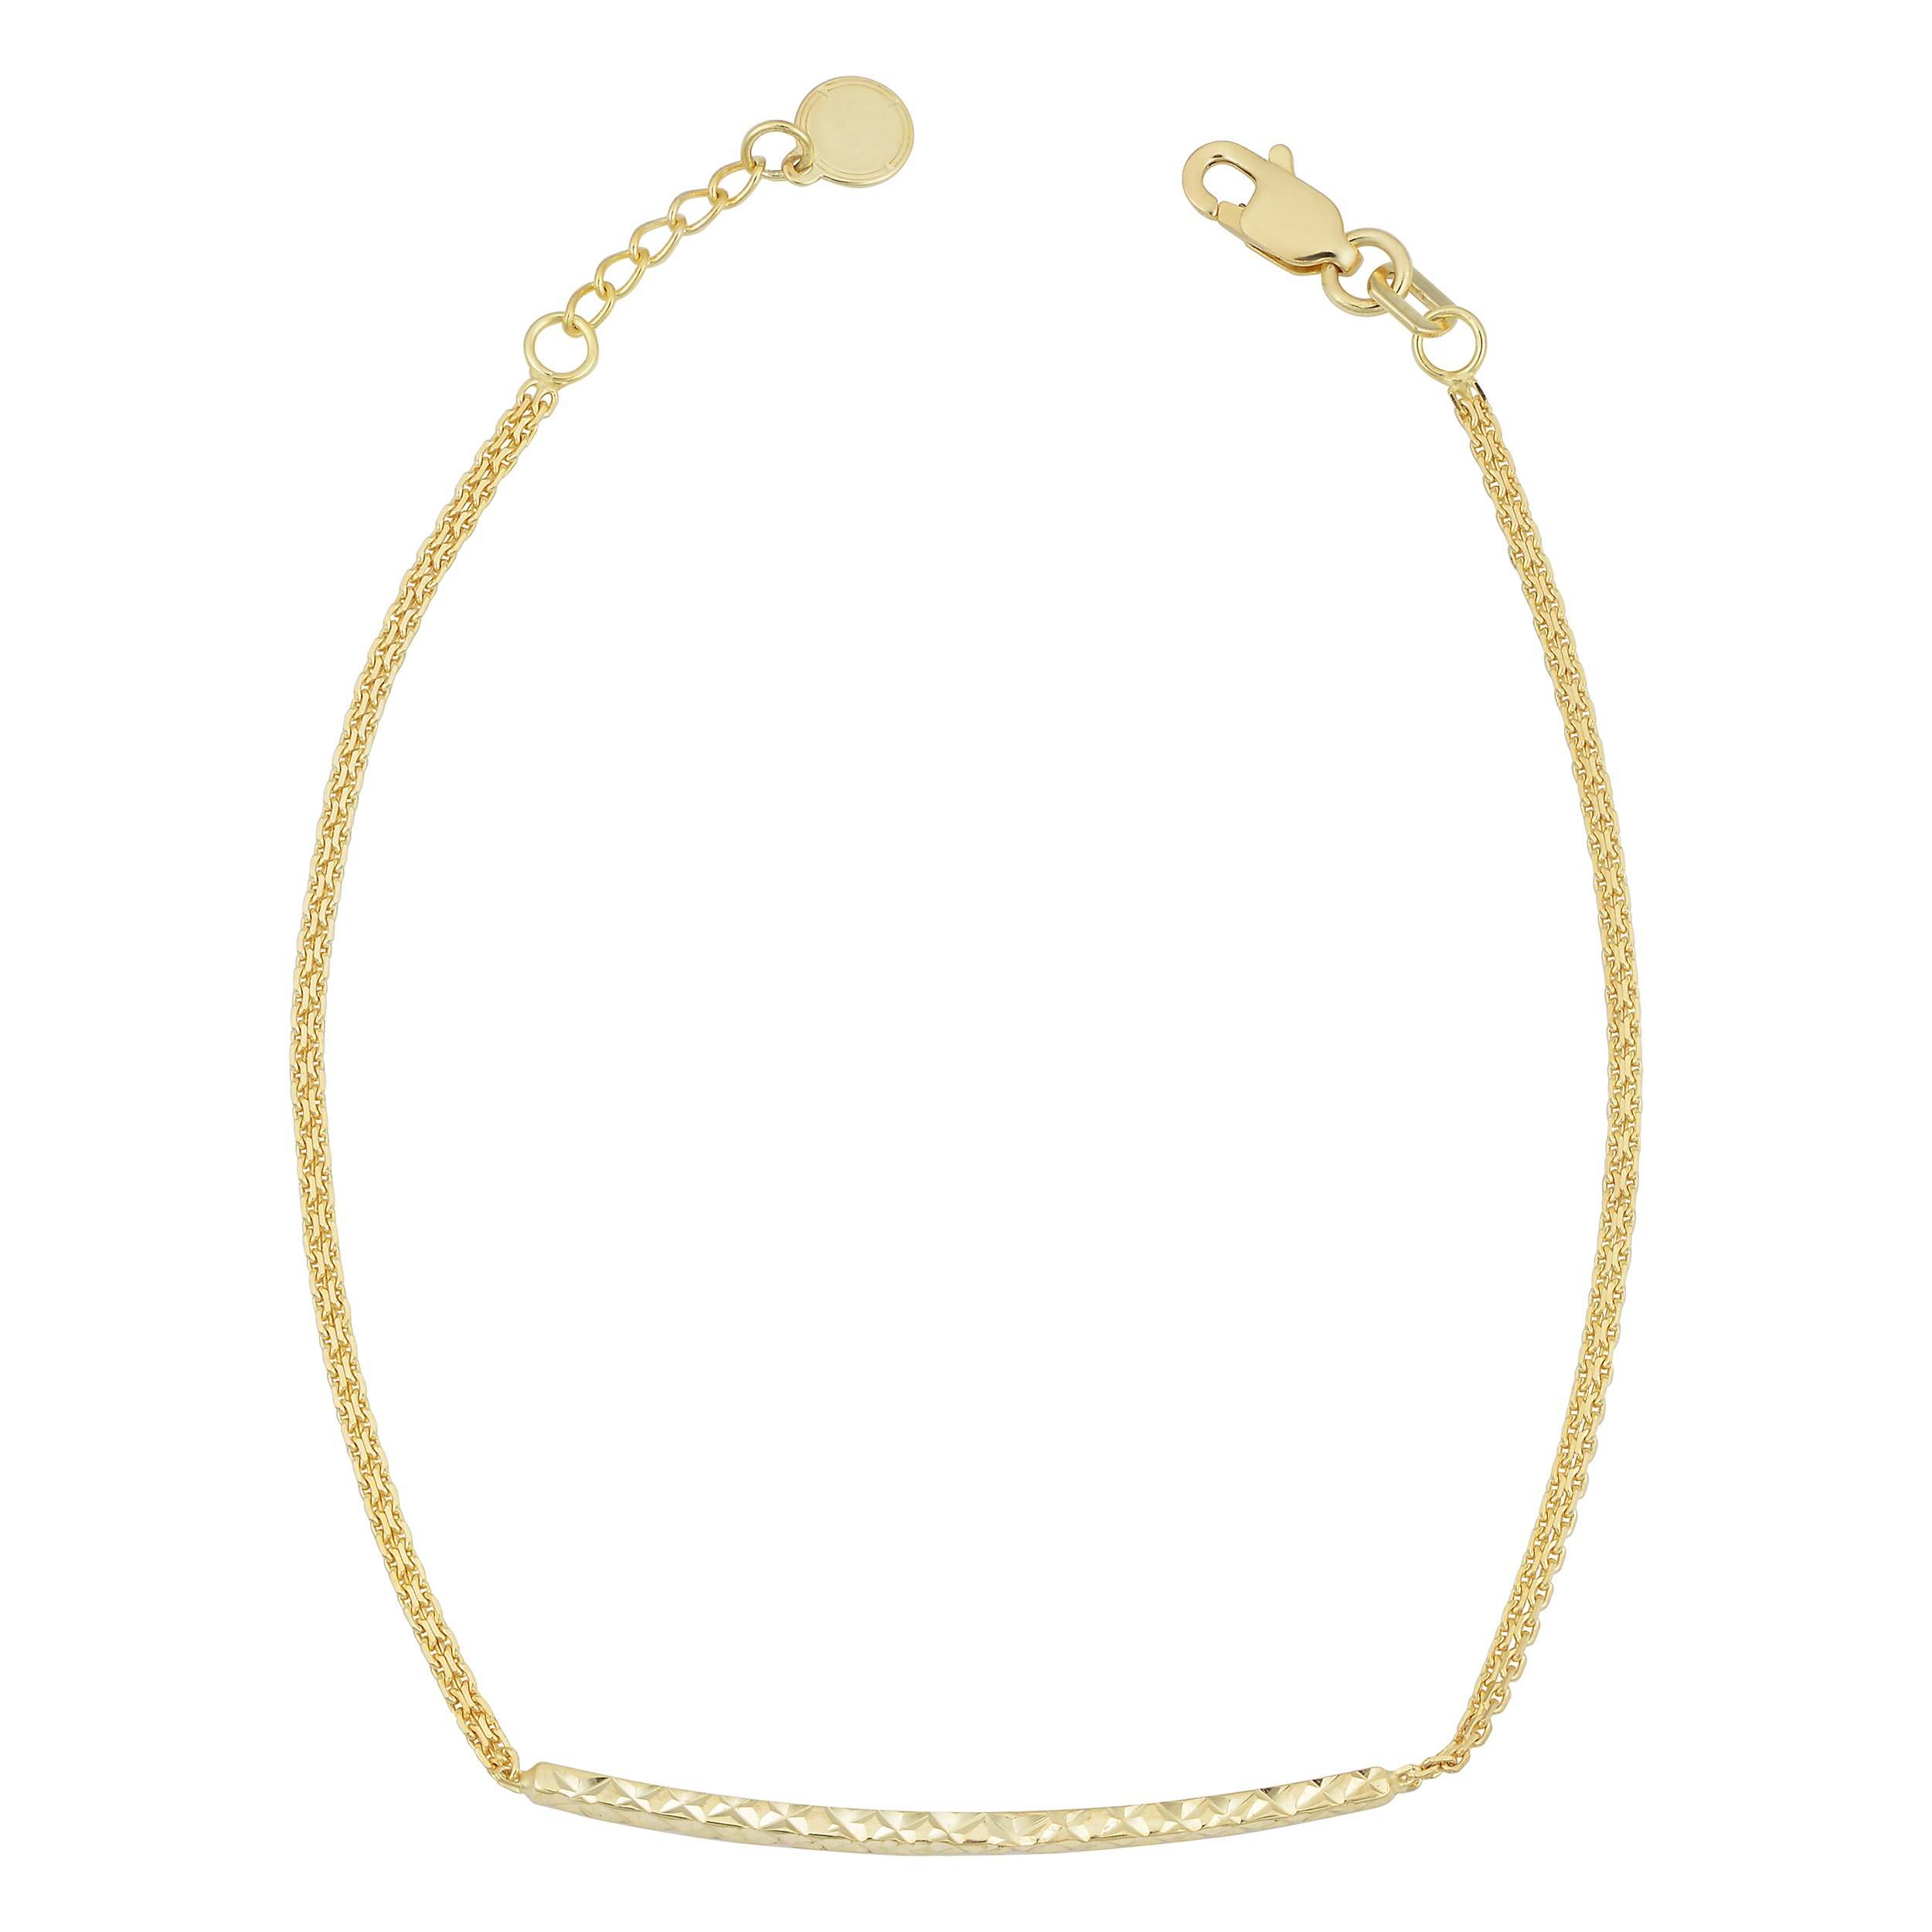 14k Yellow Gold Adjustable Length Double Strand Diamond-Cut Bar Bracelet (adjusts from 7'' - 7.5'')